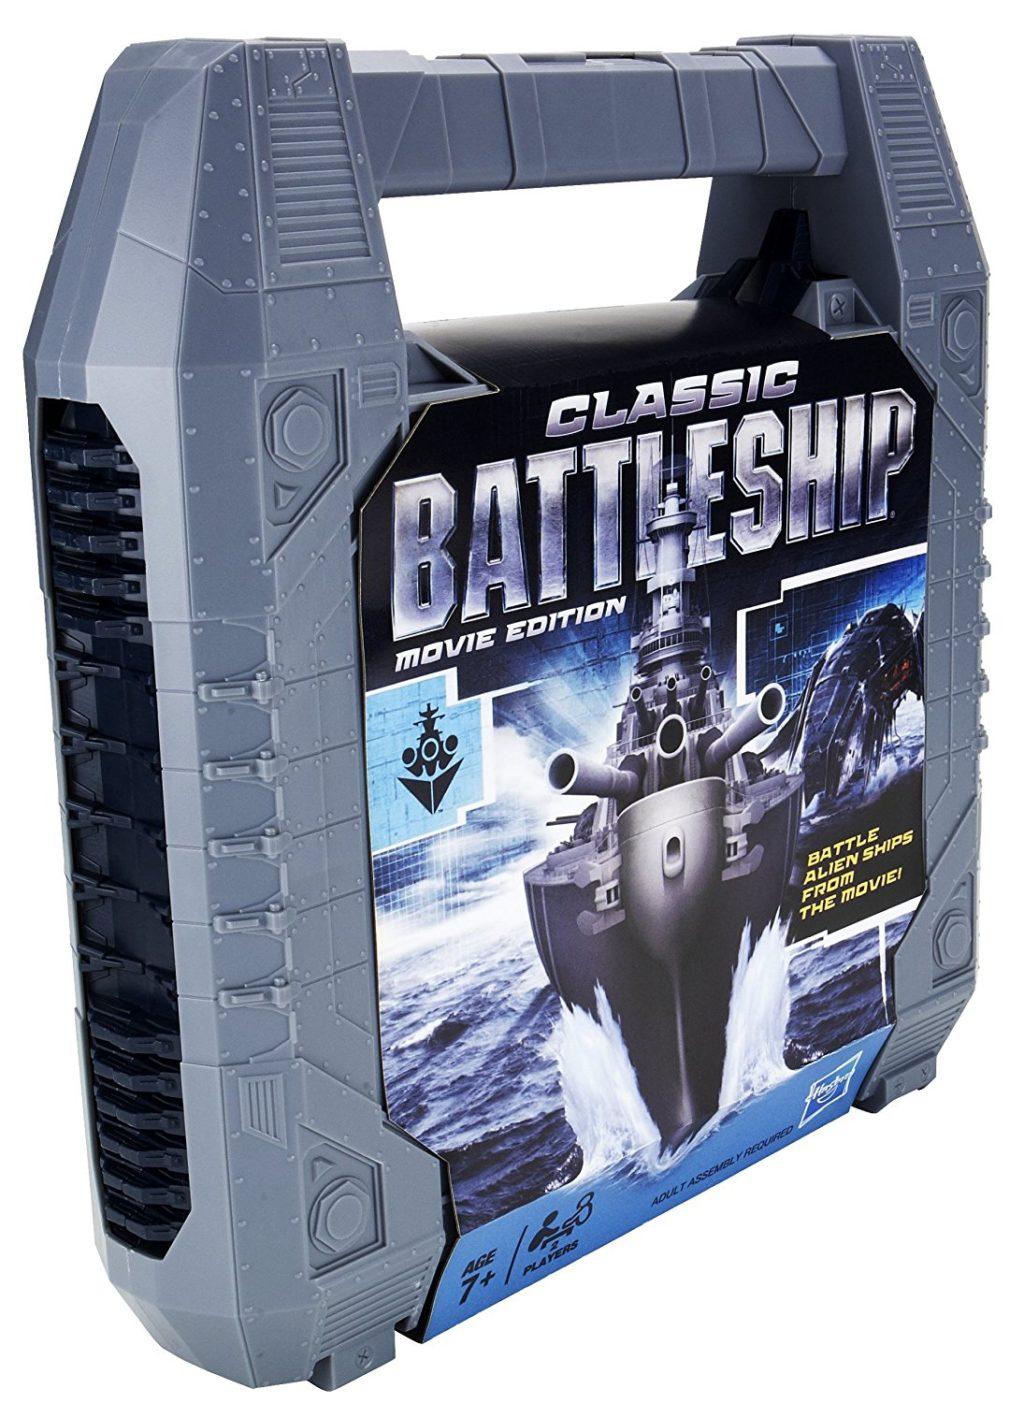 Classic Battleship Movie Edition